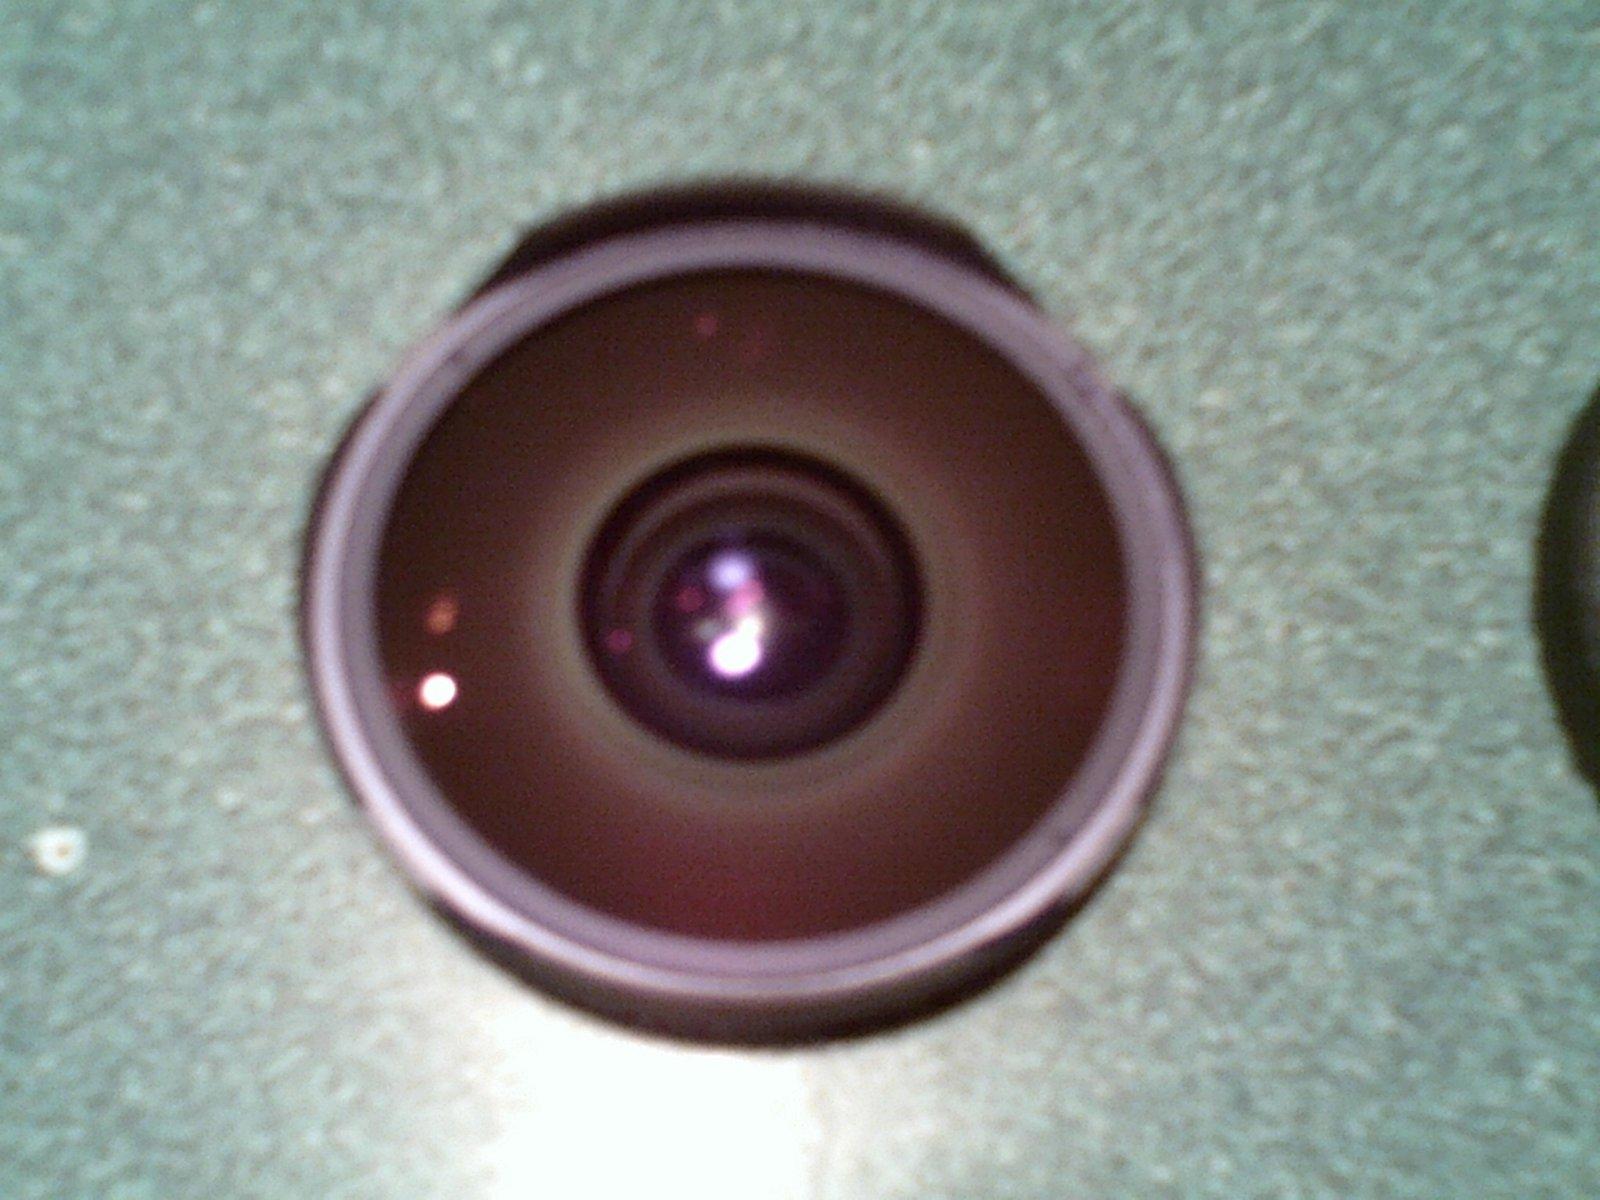 Lense 3